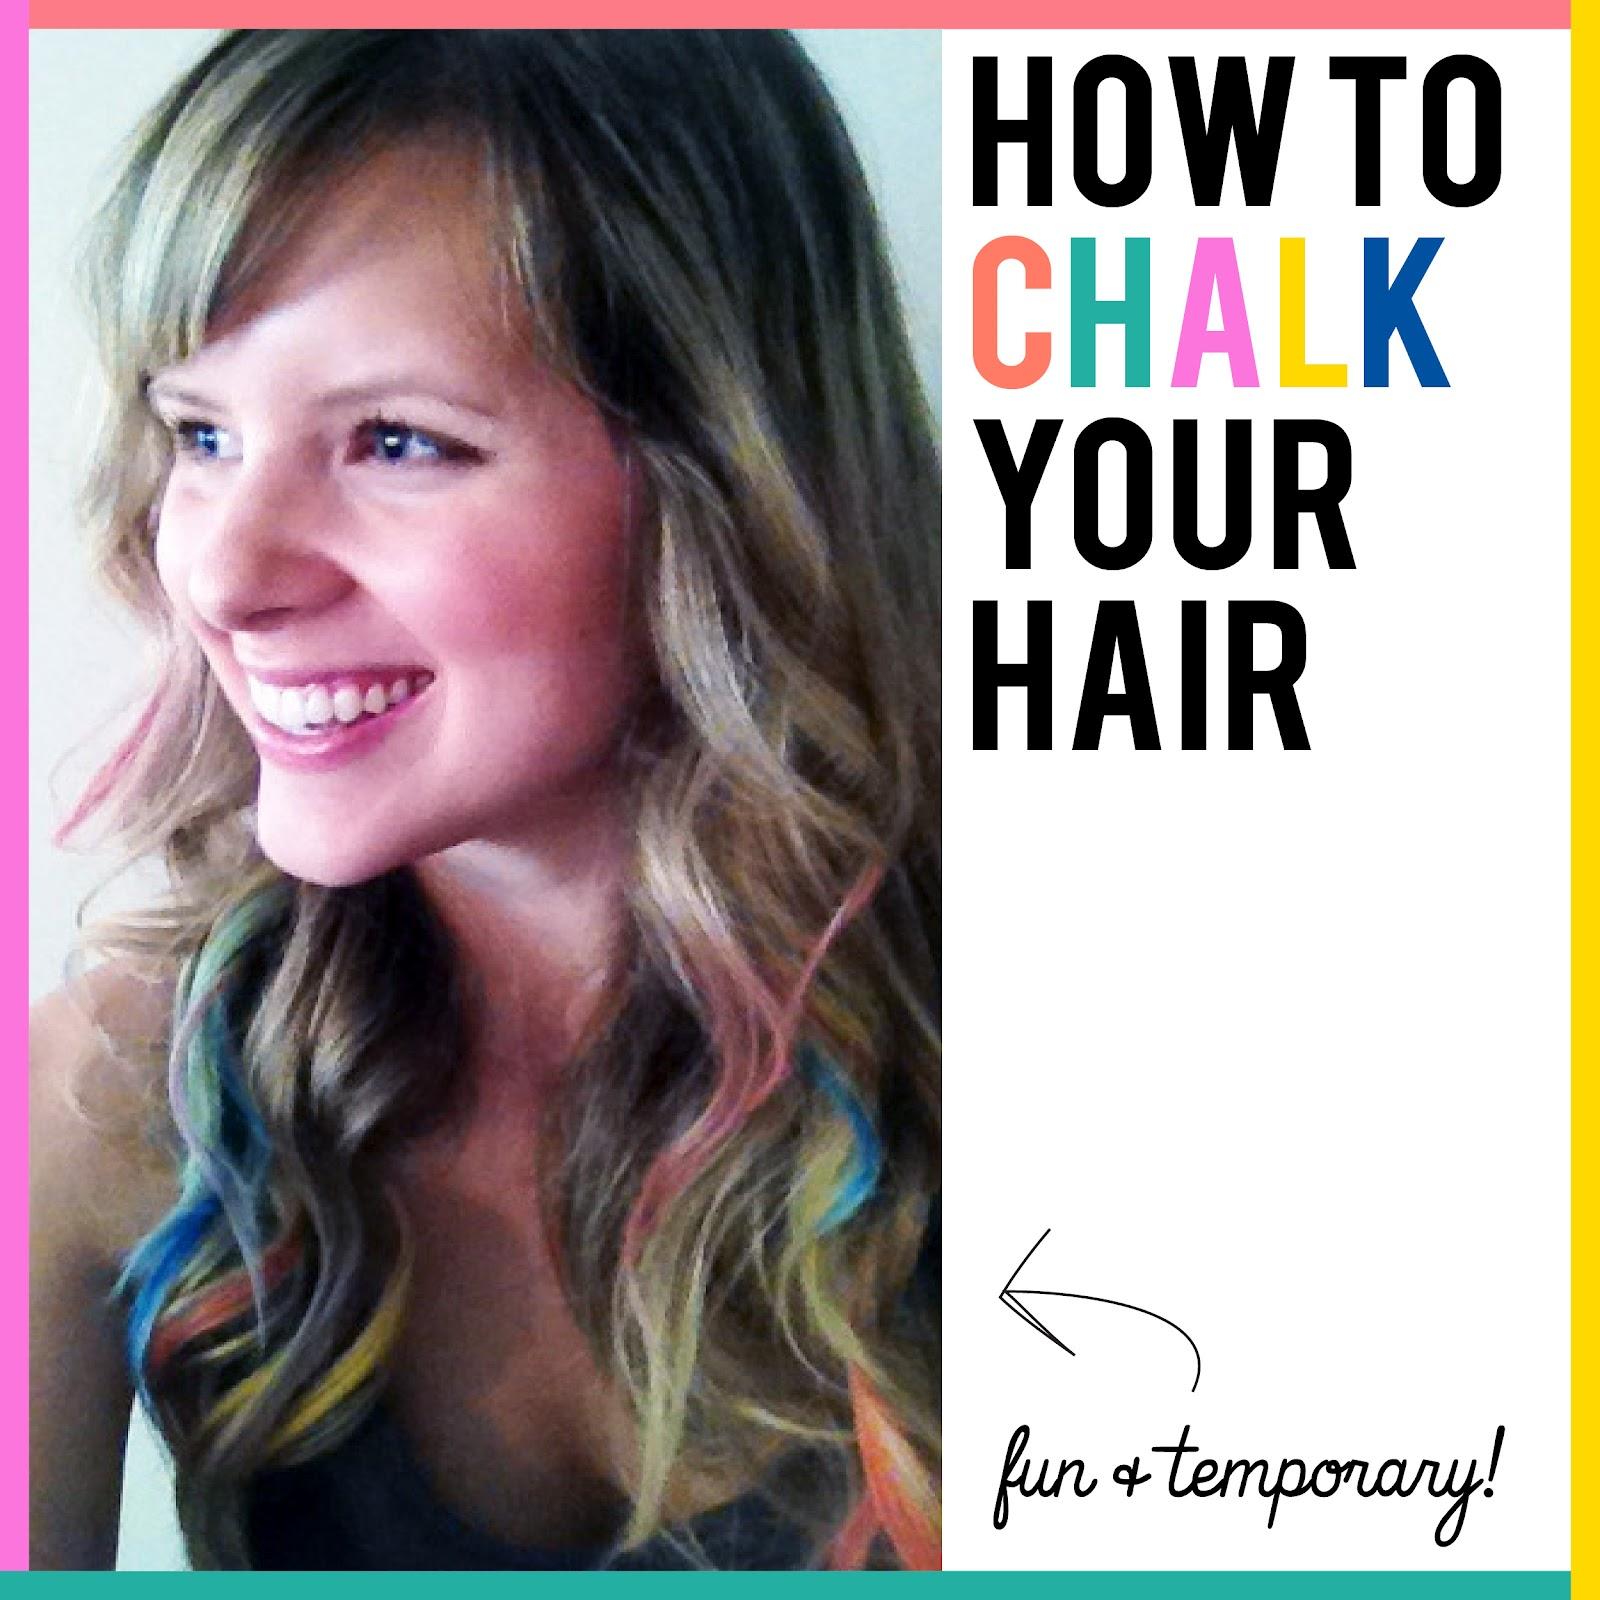 http://2.bp.blogspot.com/-yZZ9iWQhCPg/T5nHLk1DuZI/AAAAAAAABEA/ltXZyYOwOmA/s1600/hair+chalk+main+image.jpg